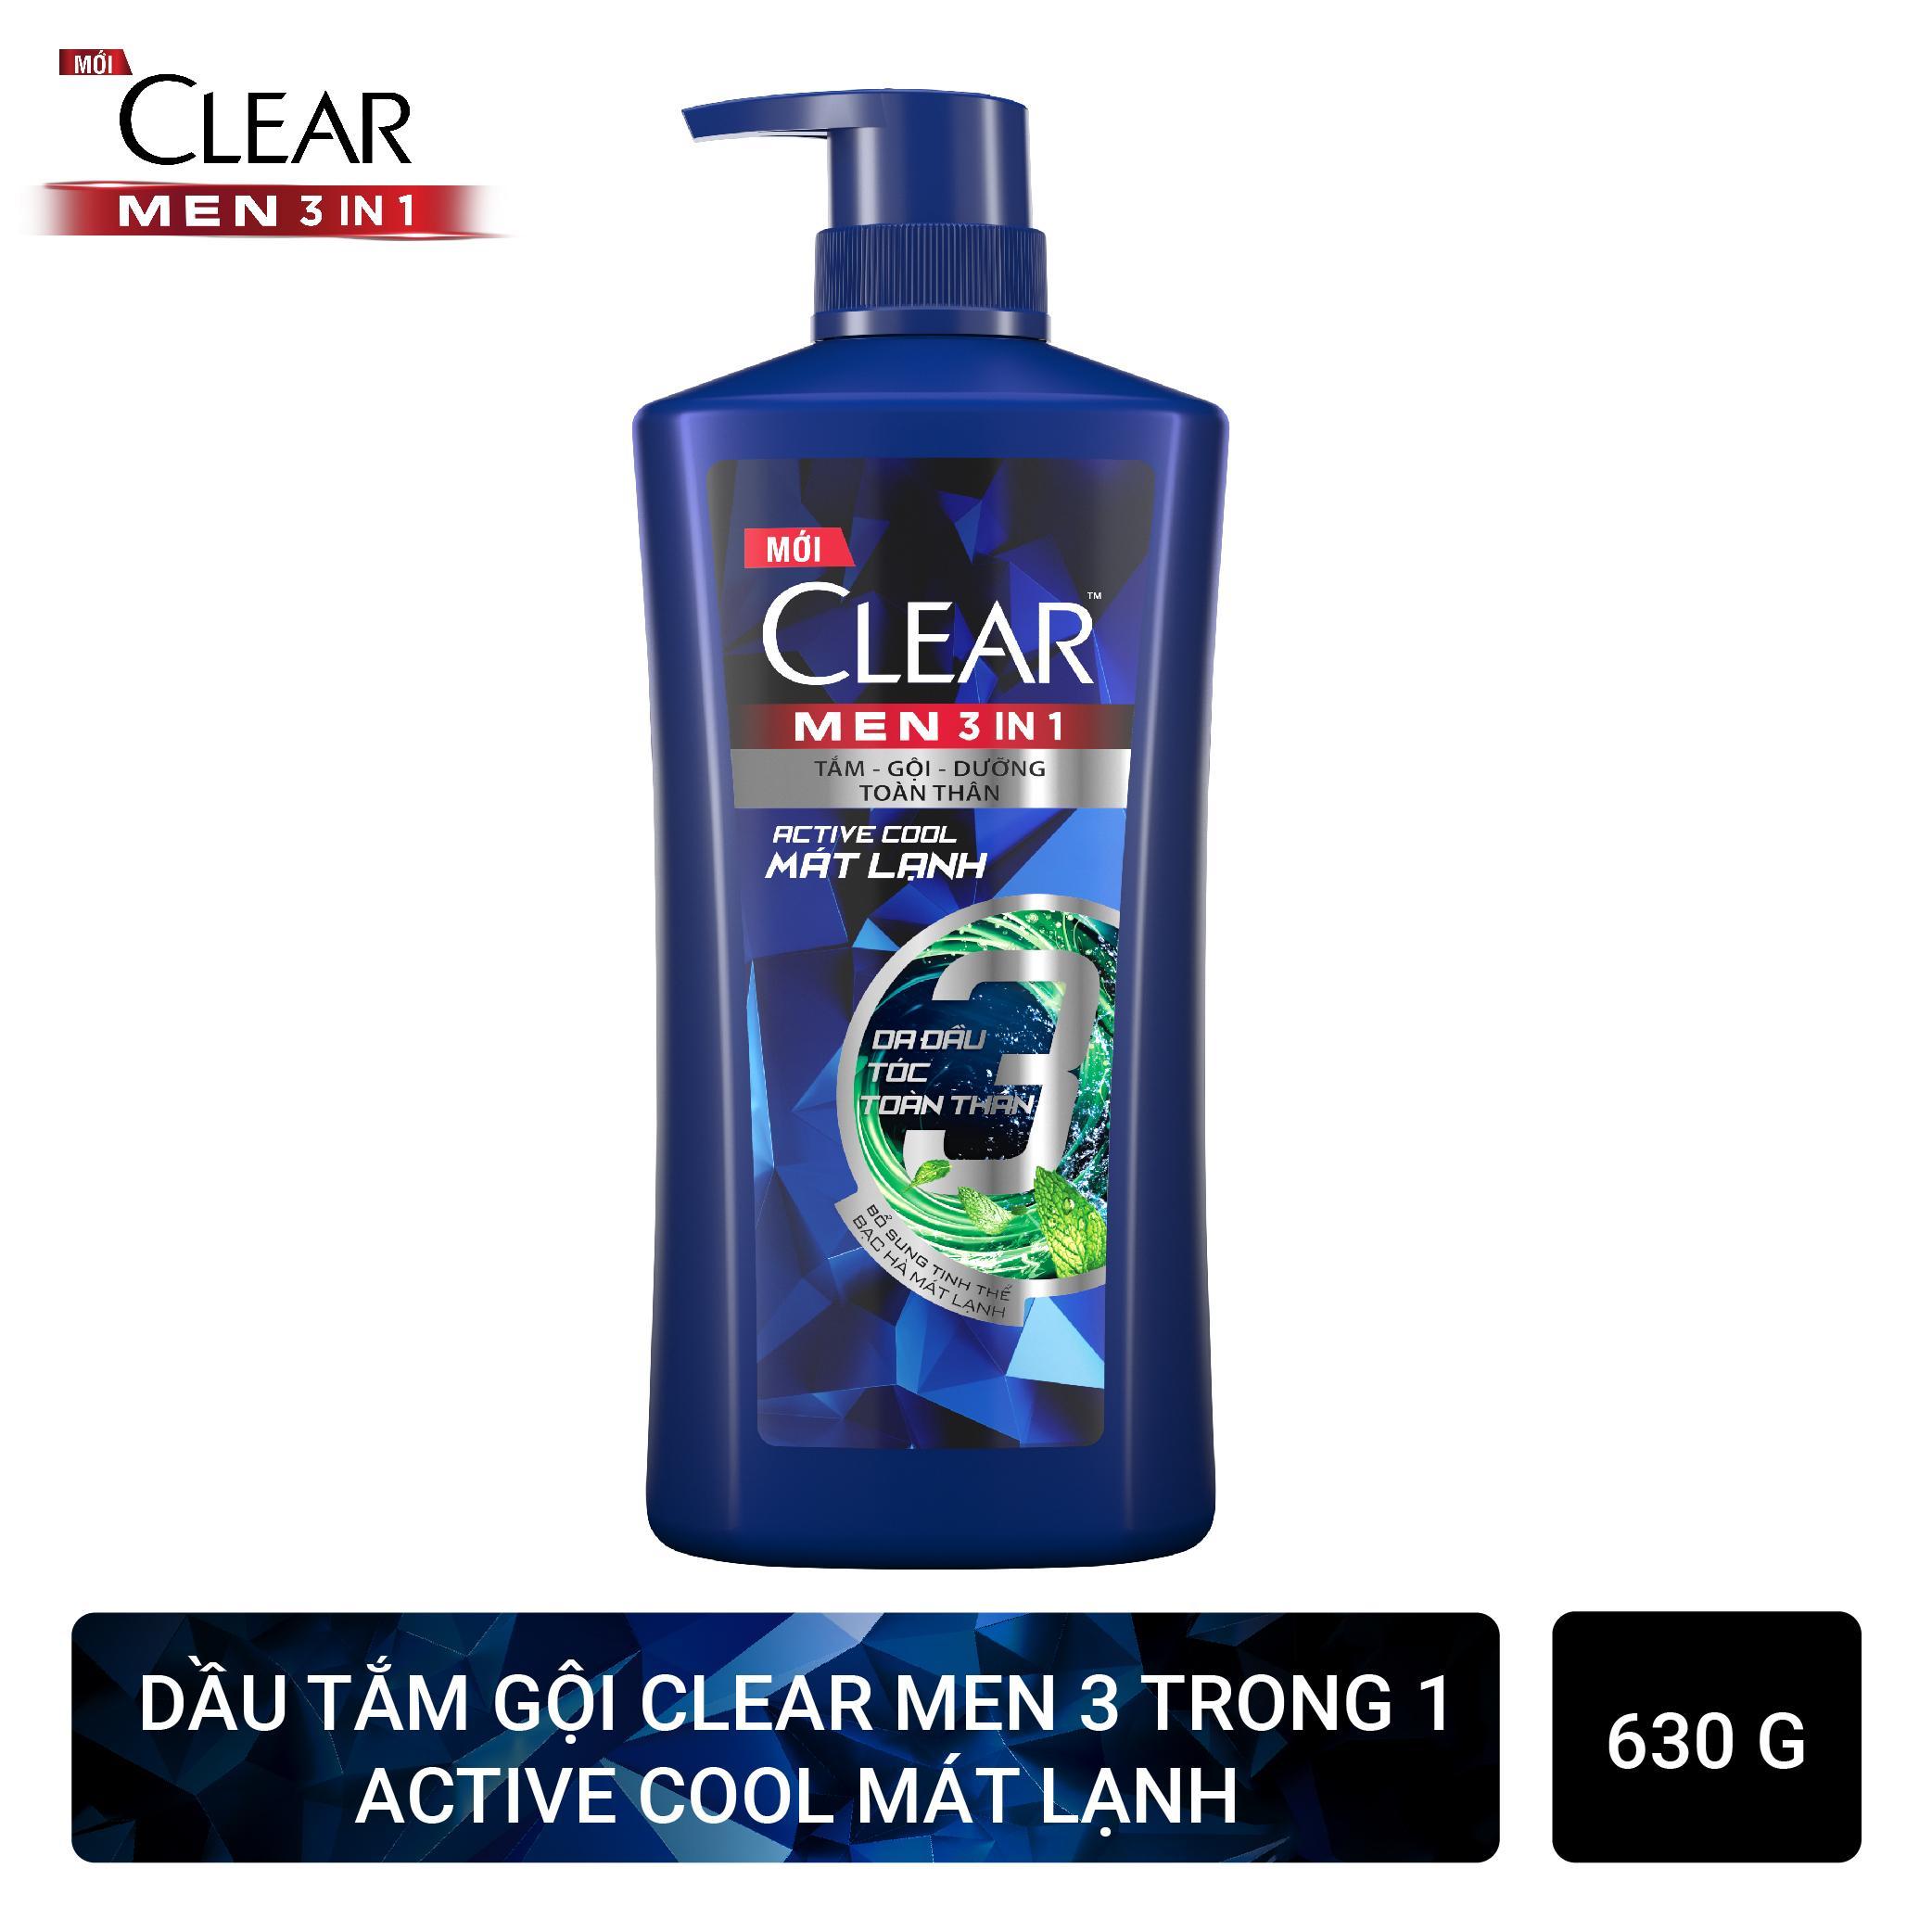 CLEAR dầu gội nam 3in1 mát lạnh 630g/chai